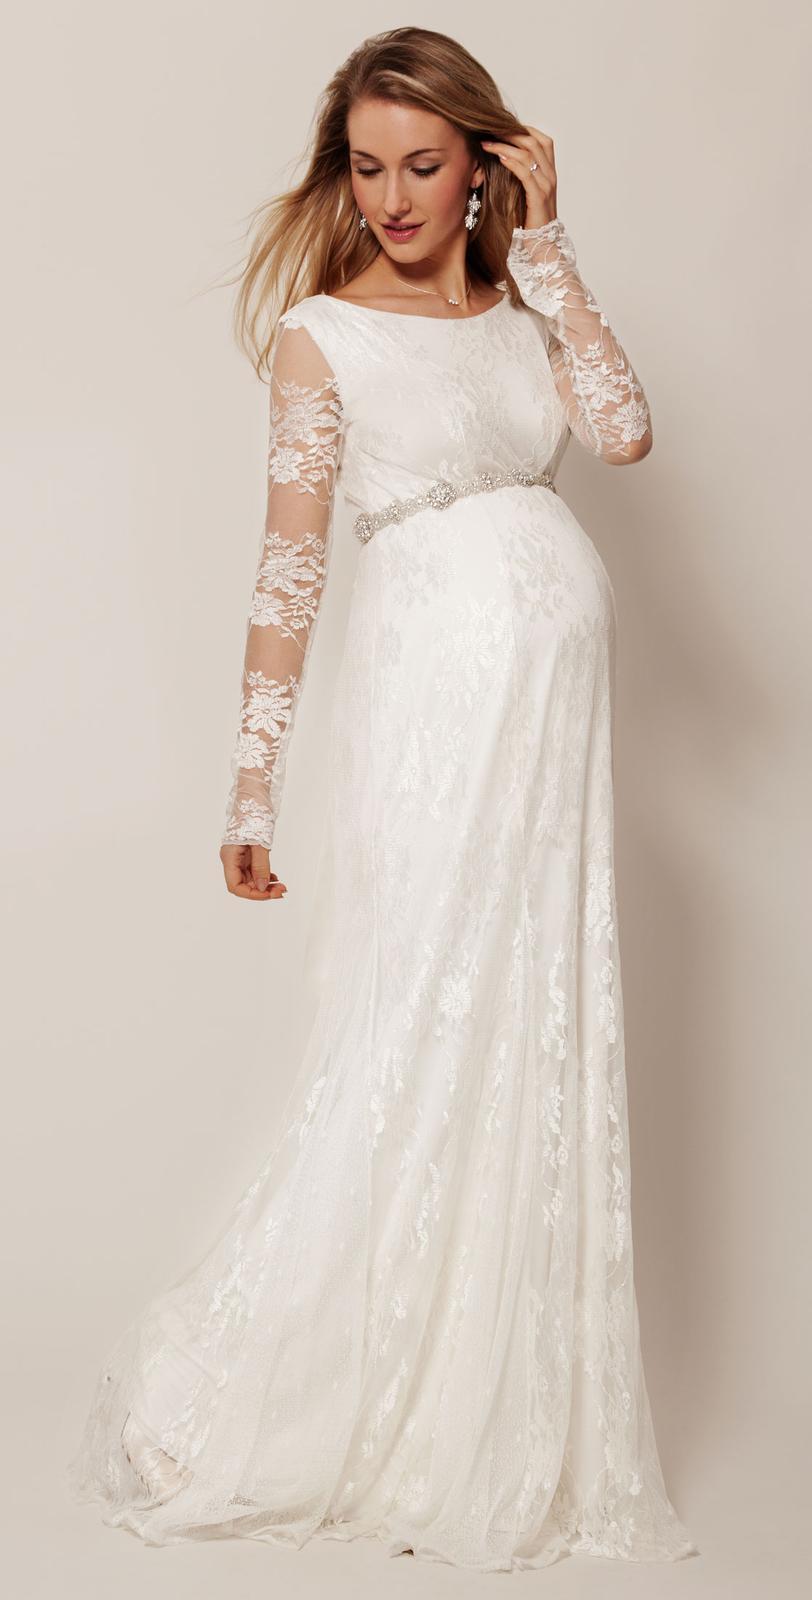 Tehu šaty - Obrázok č. 43